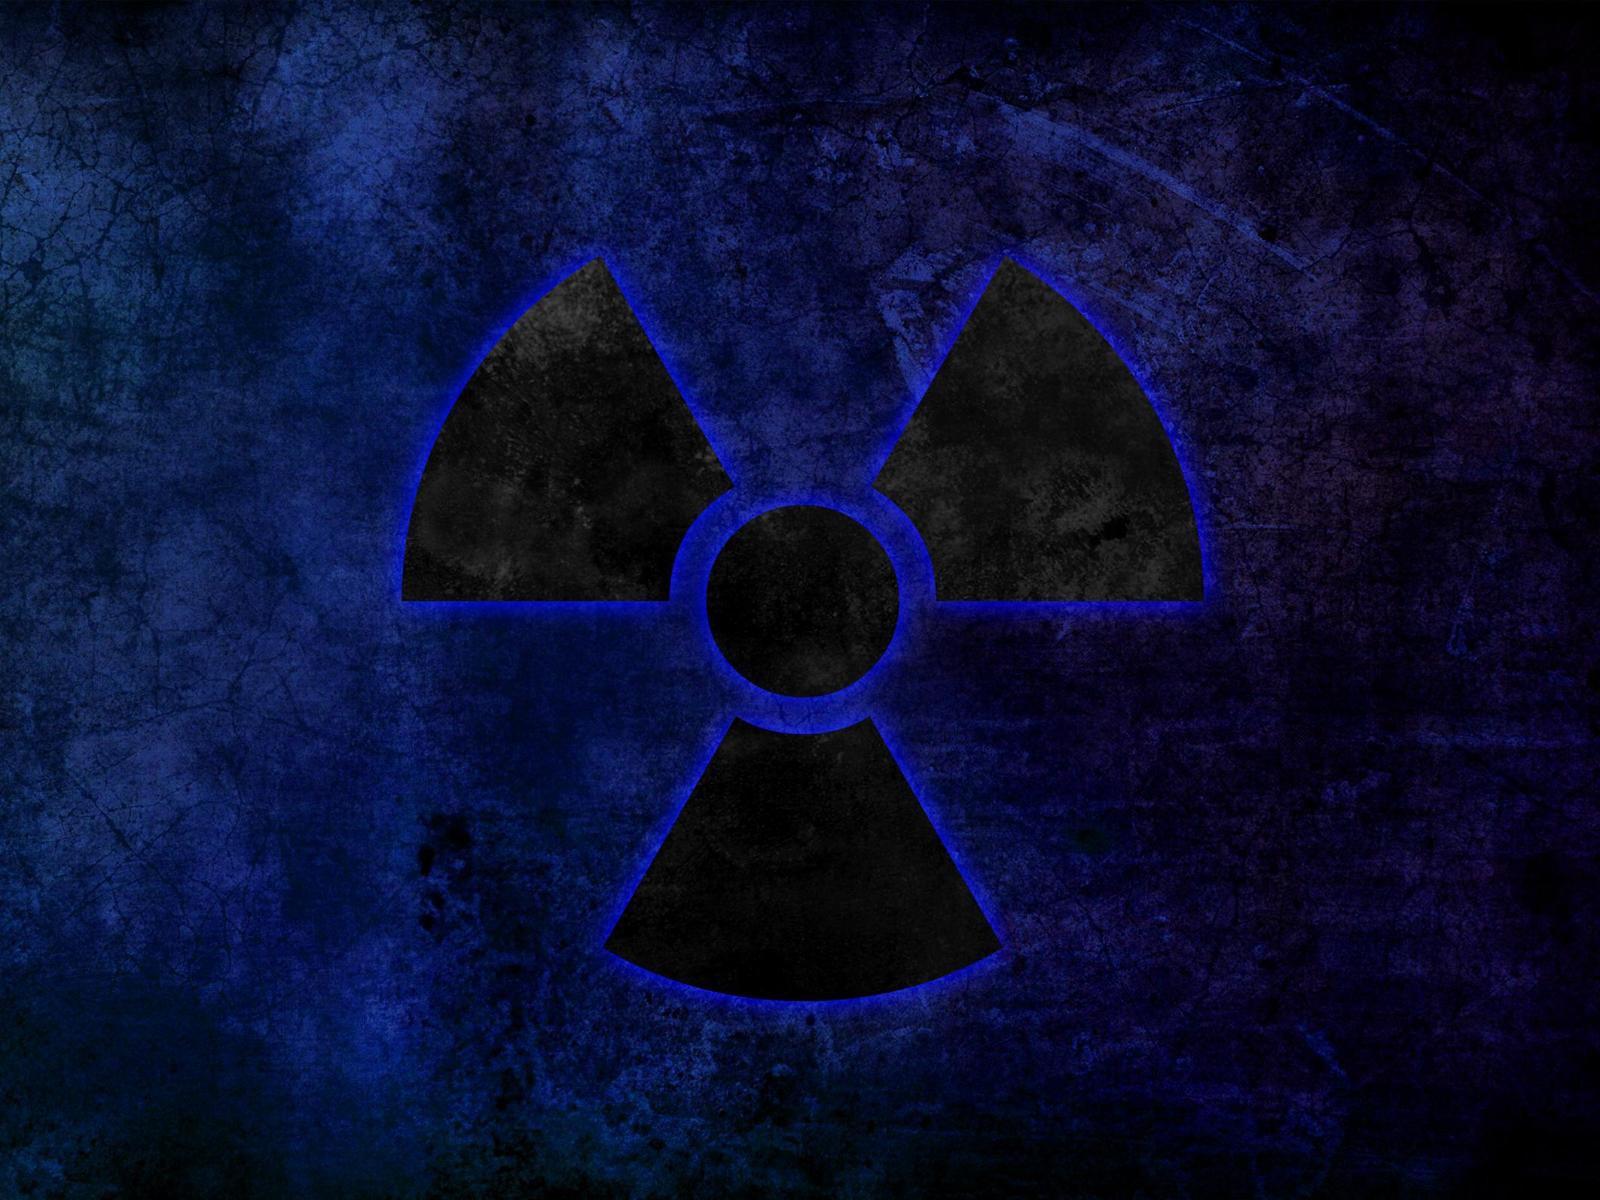 Nuke Wallpaper Blue and black nuke wallpaper 1600x1200